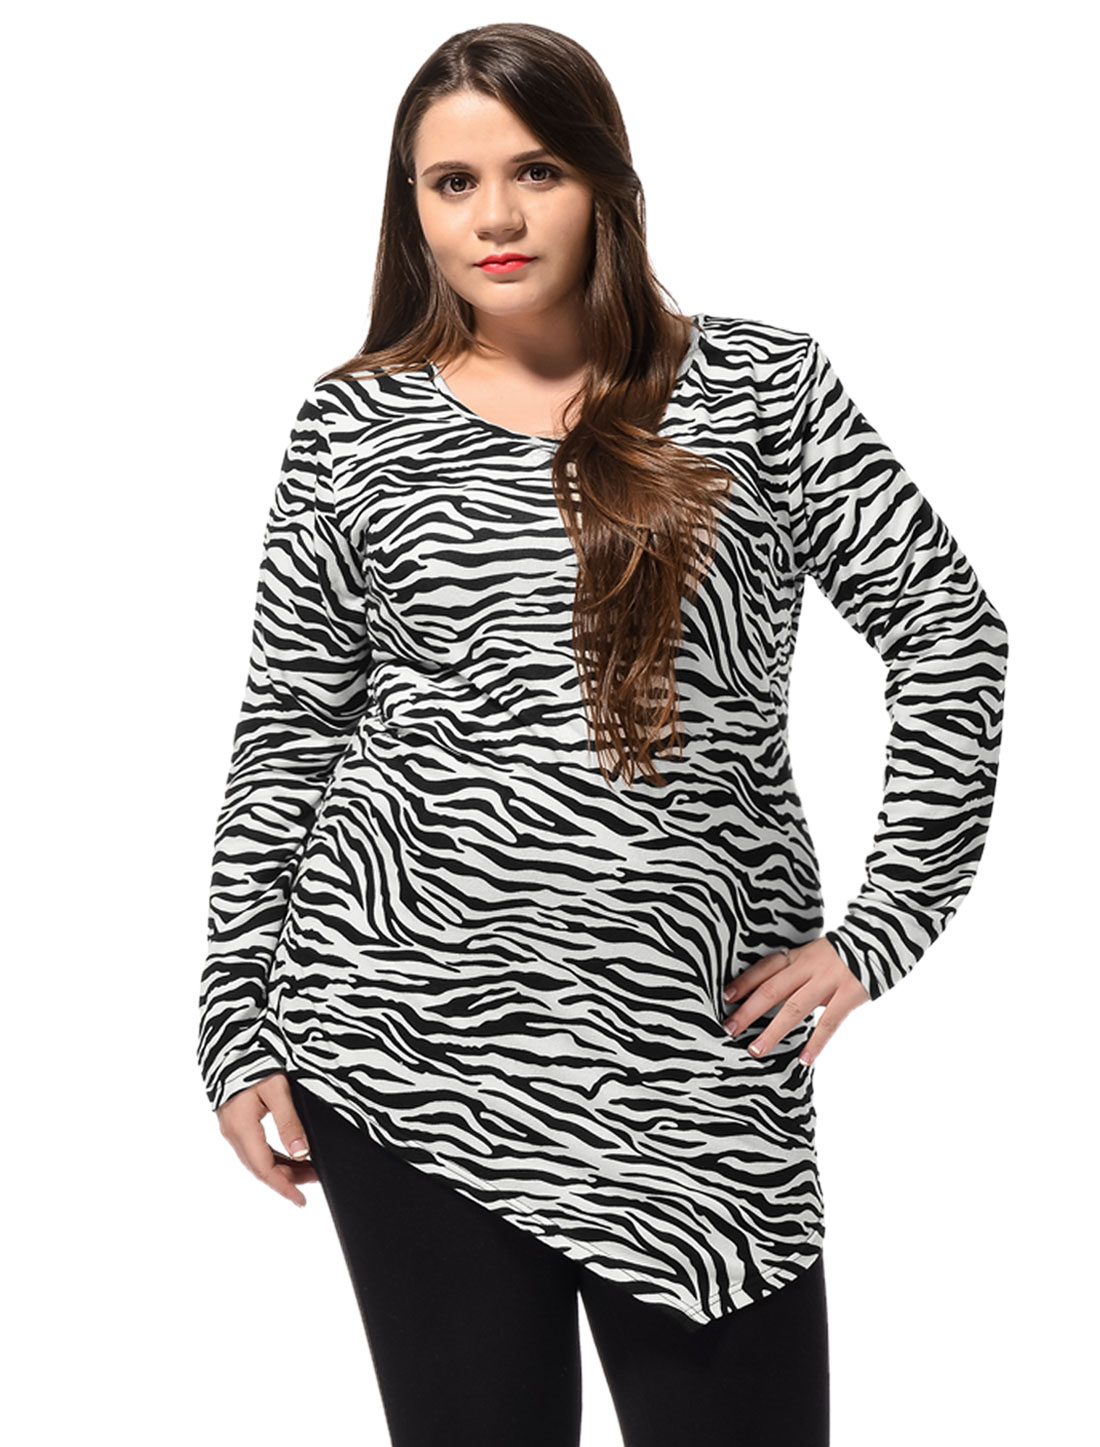 Women Plus Size Zebra Print Irregular Hem Long Sleeves Top Ivory 3X